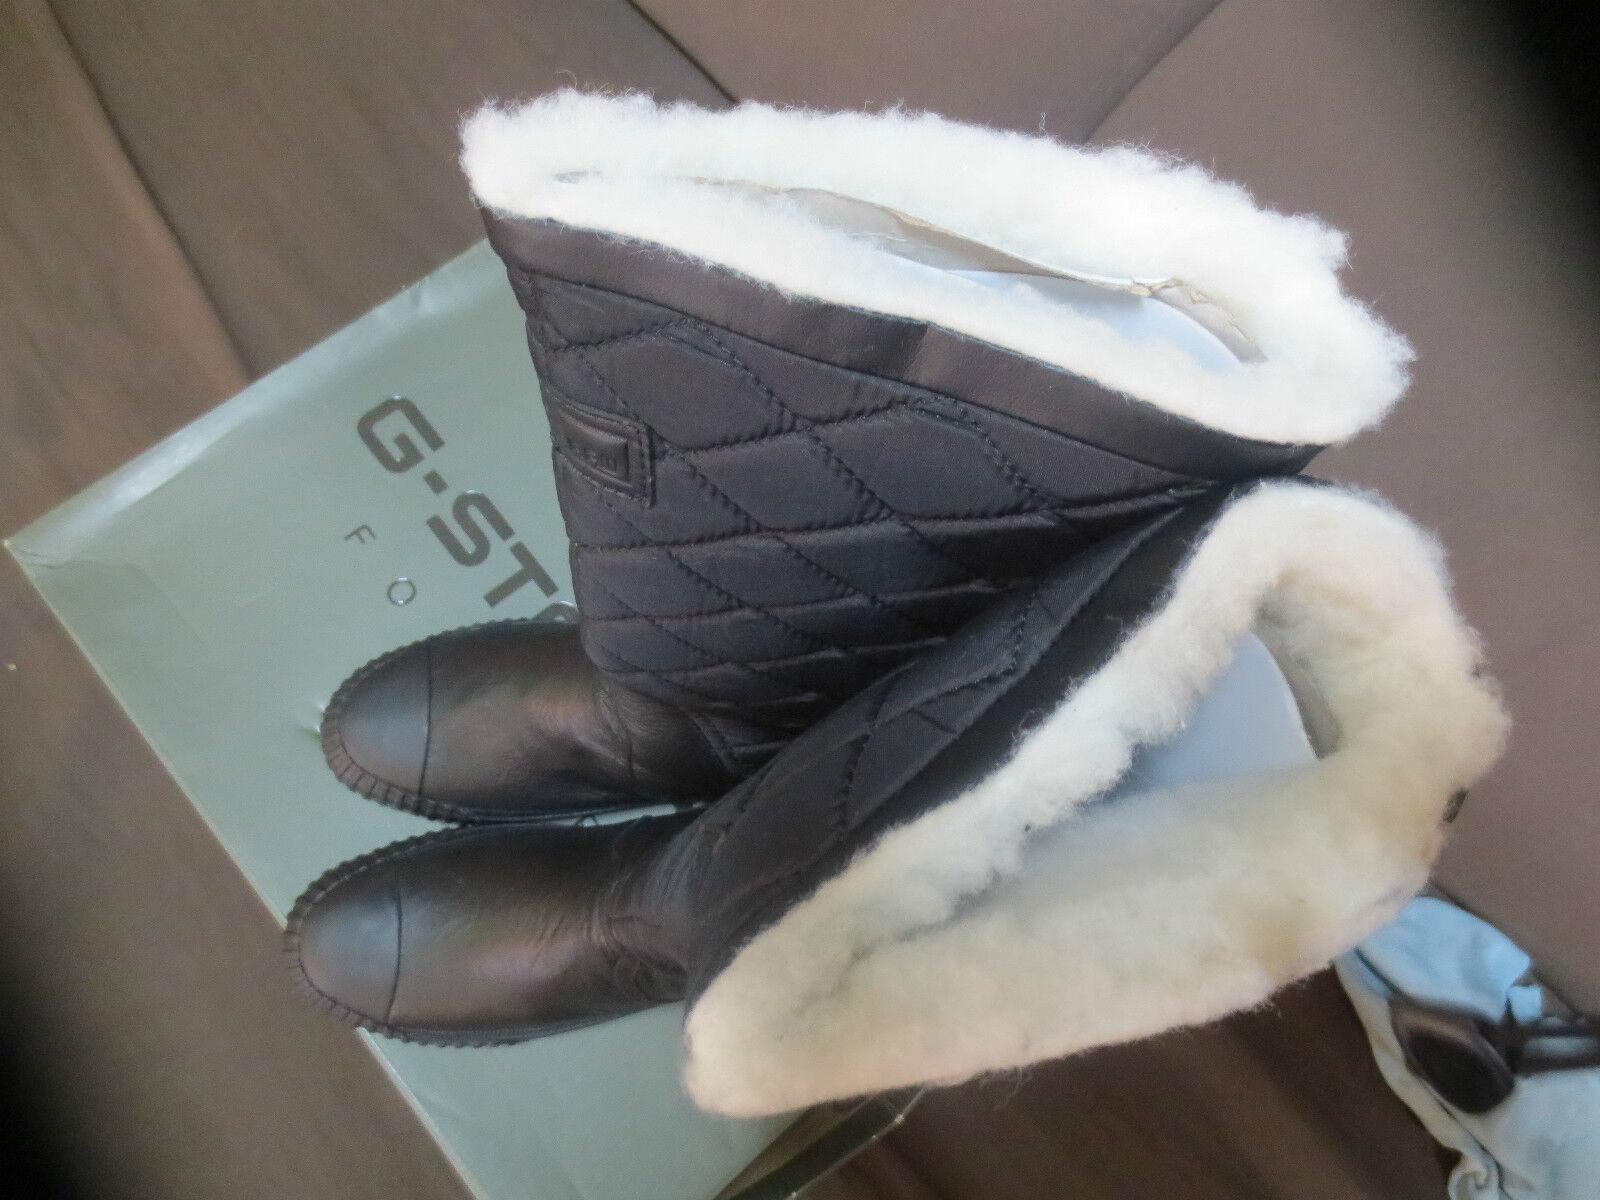 g Stern Stiefel Leder,Nylon Schuhgrößen gefüttert Neu Wert 179e Schuhgrößen Leder,Nylon 36,38,41 3e93d0